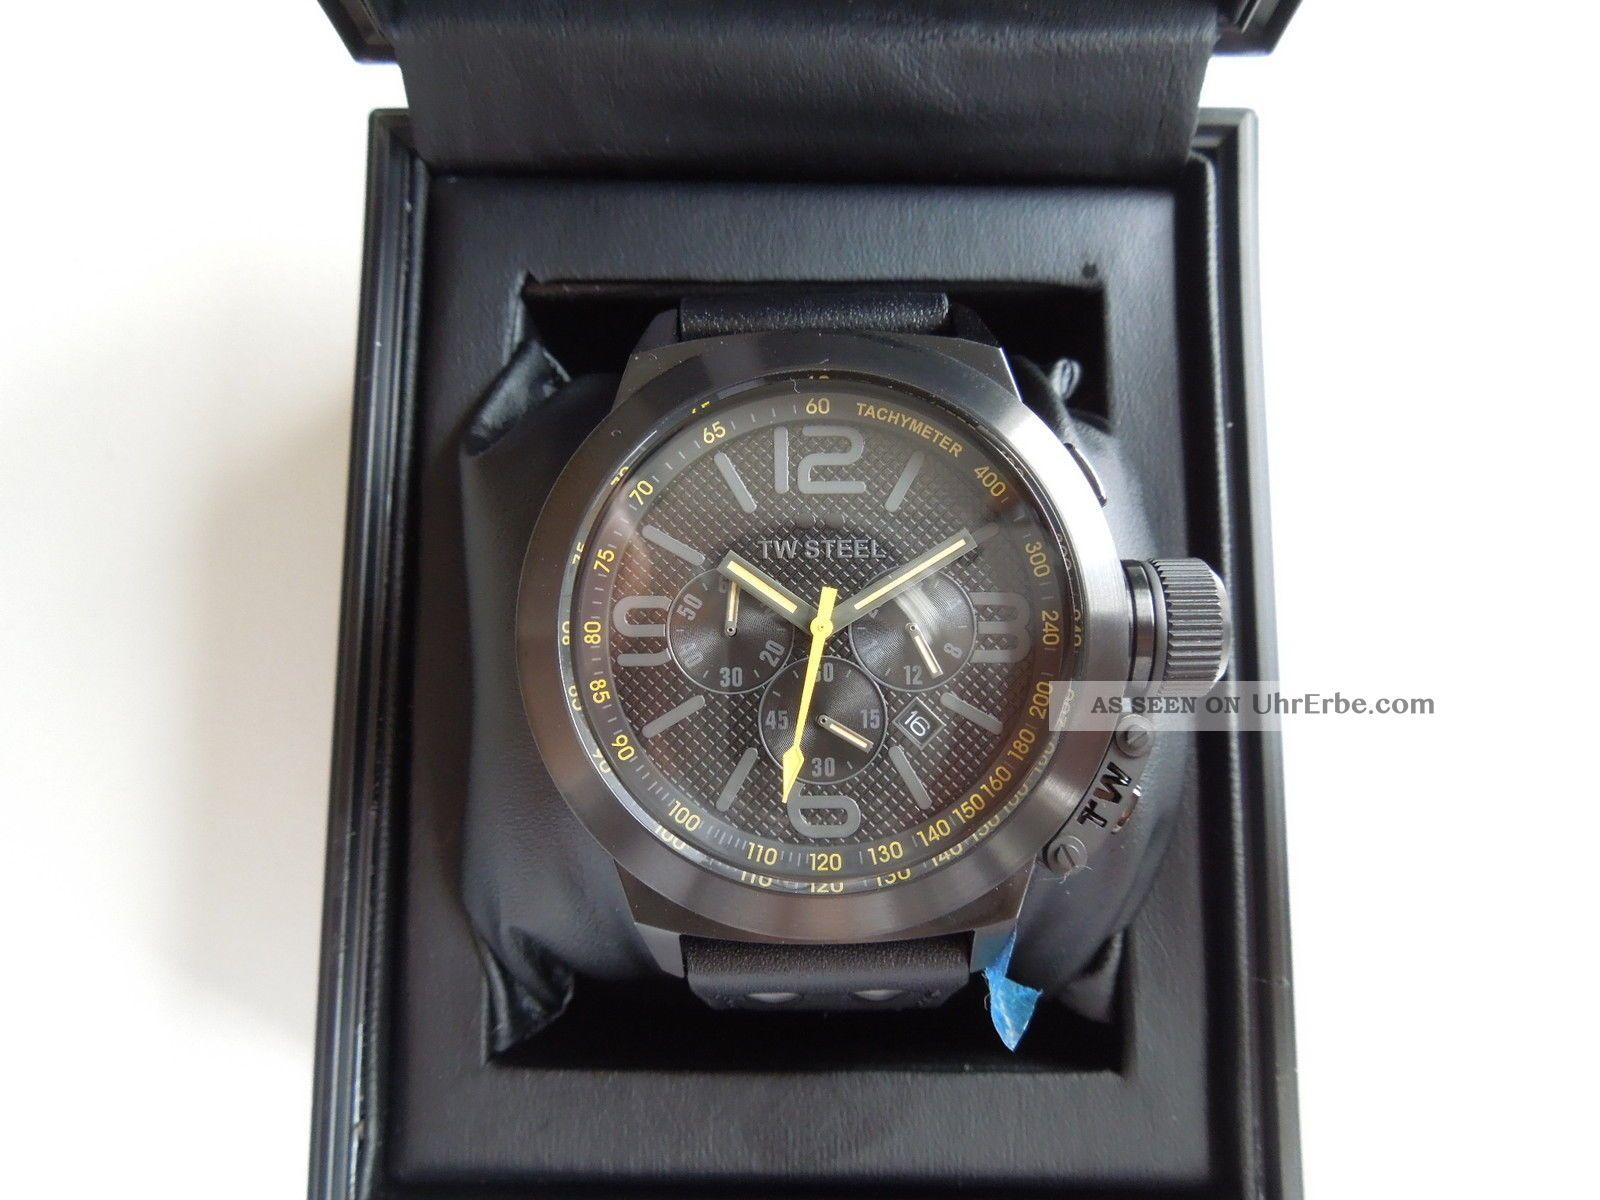 Tw Steel Canteen Canteen Style Cool Black Tw - 900 Watch In Ovp Armbanduhren Bild